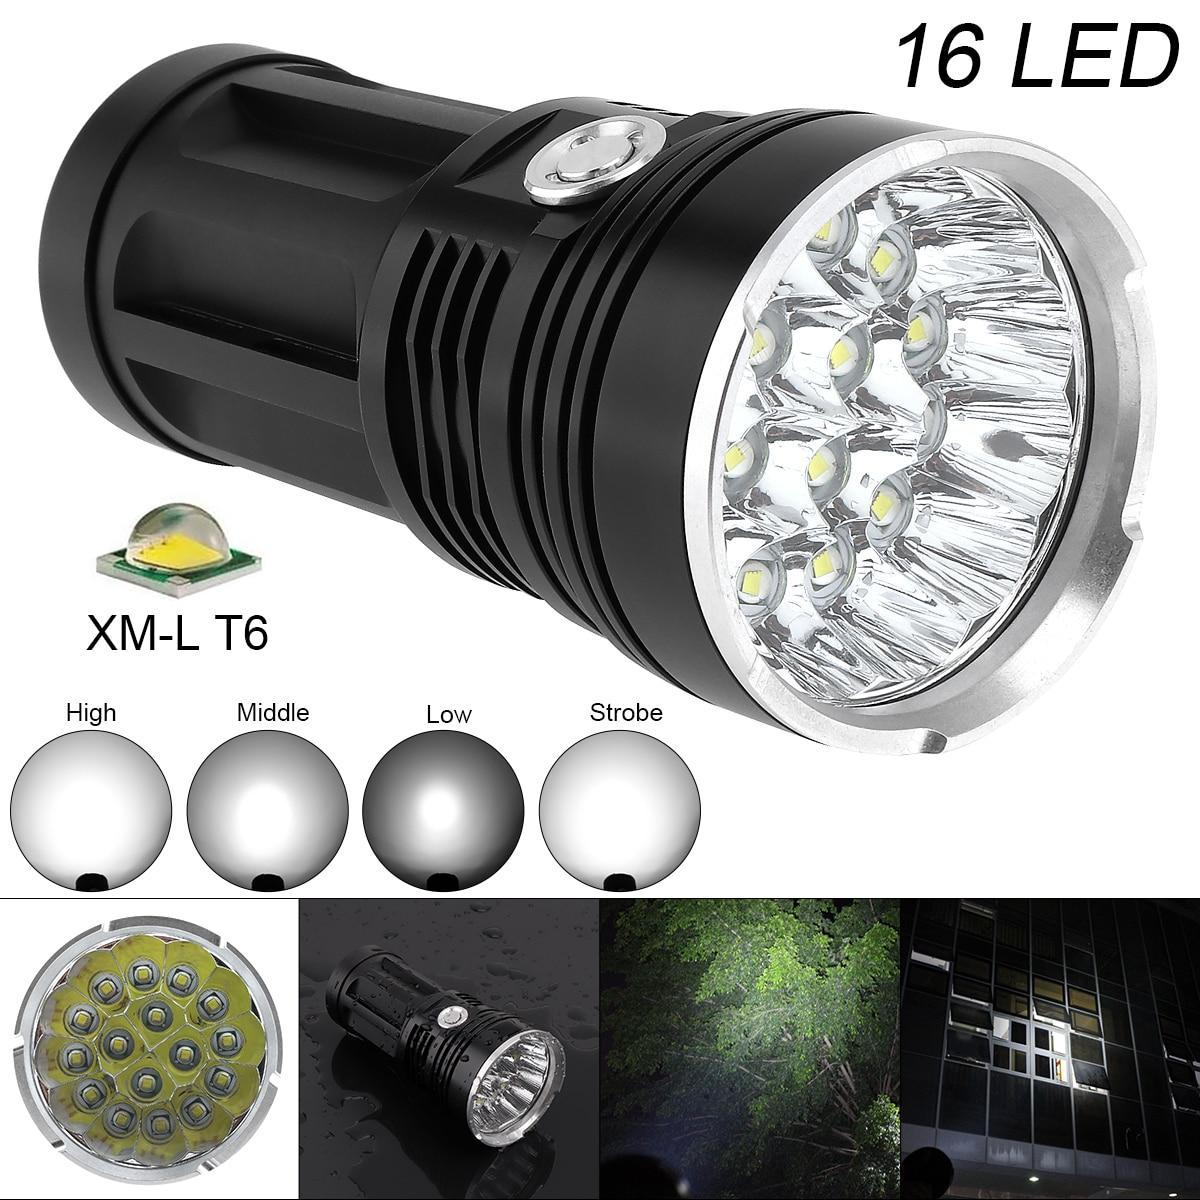 Light King 16/18T6 LED flash light 16/18*XM-L T6 LED Flashlight Torch Lamp Light For Hunting Campingf Backpacking Fishing коммутатор zyxel gs1100 16 gs1100 16 eu0101f